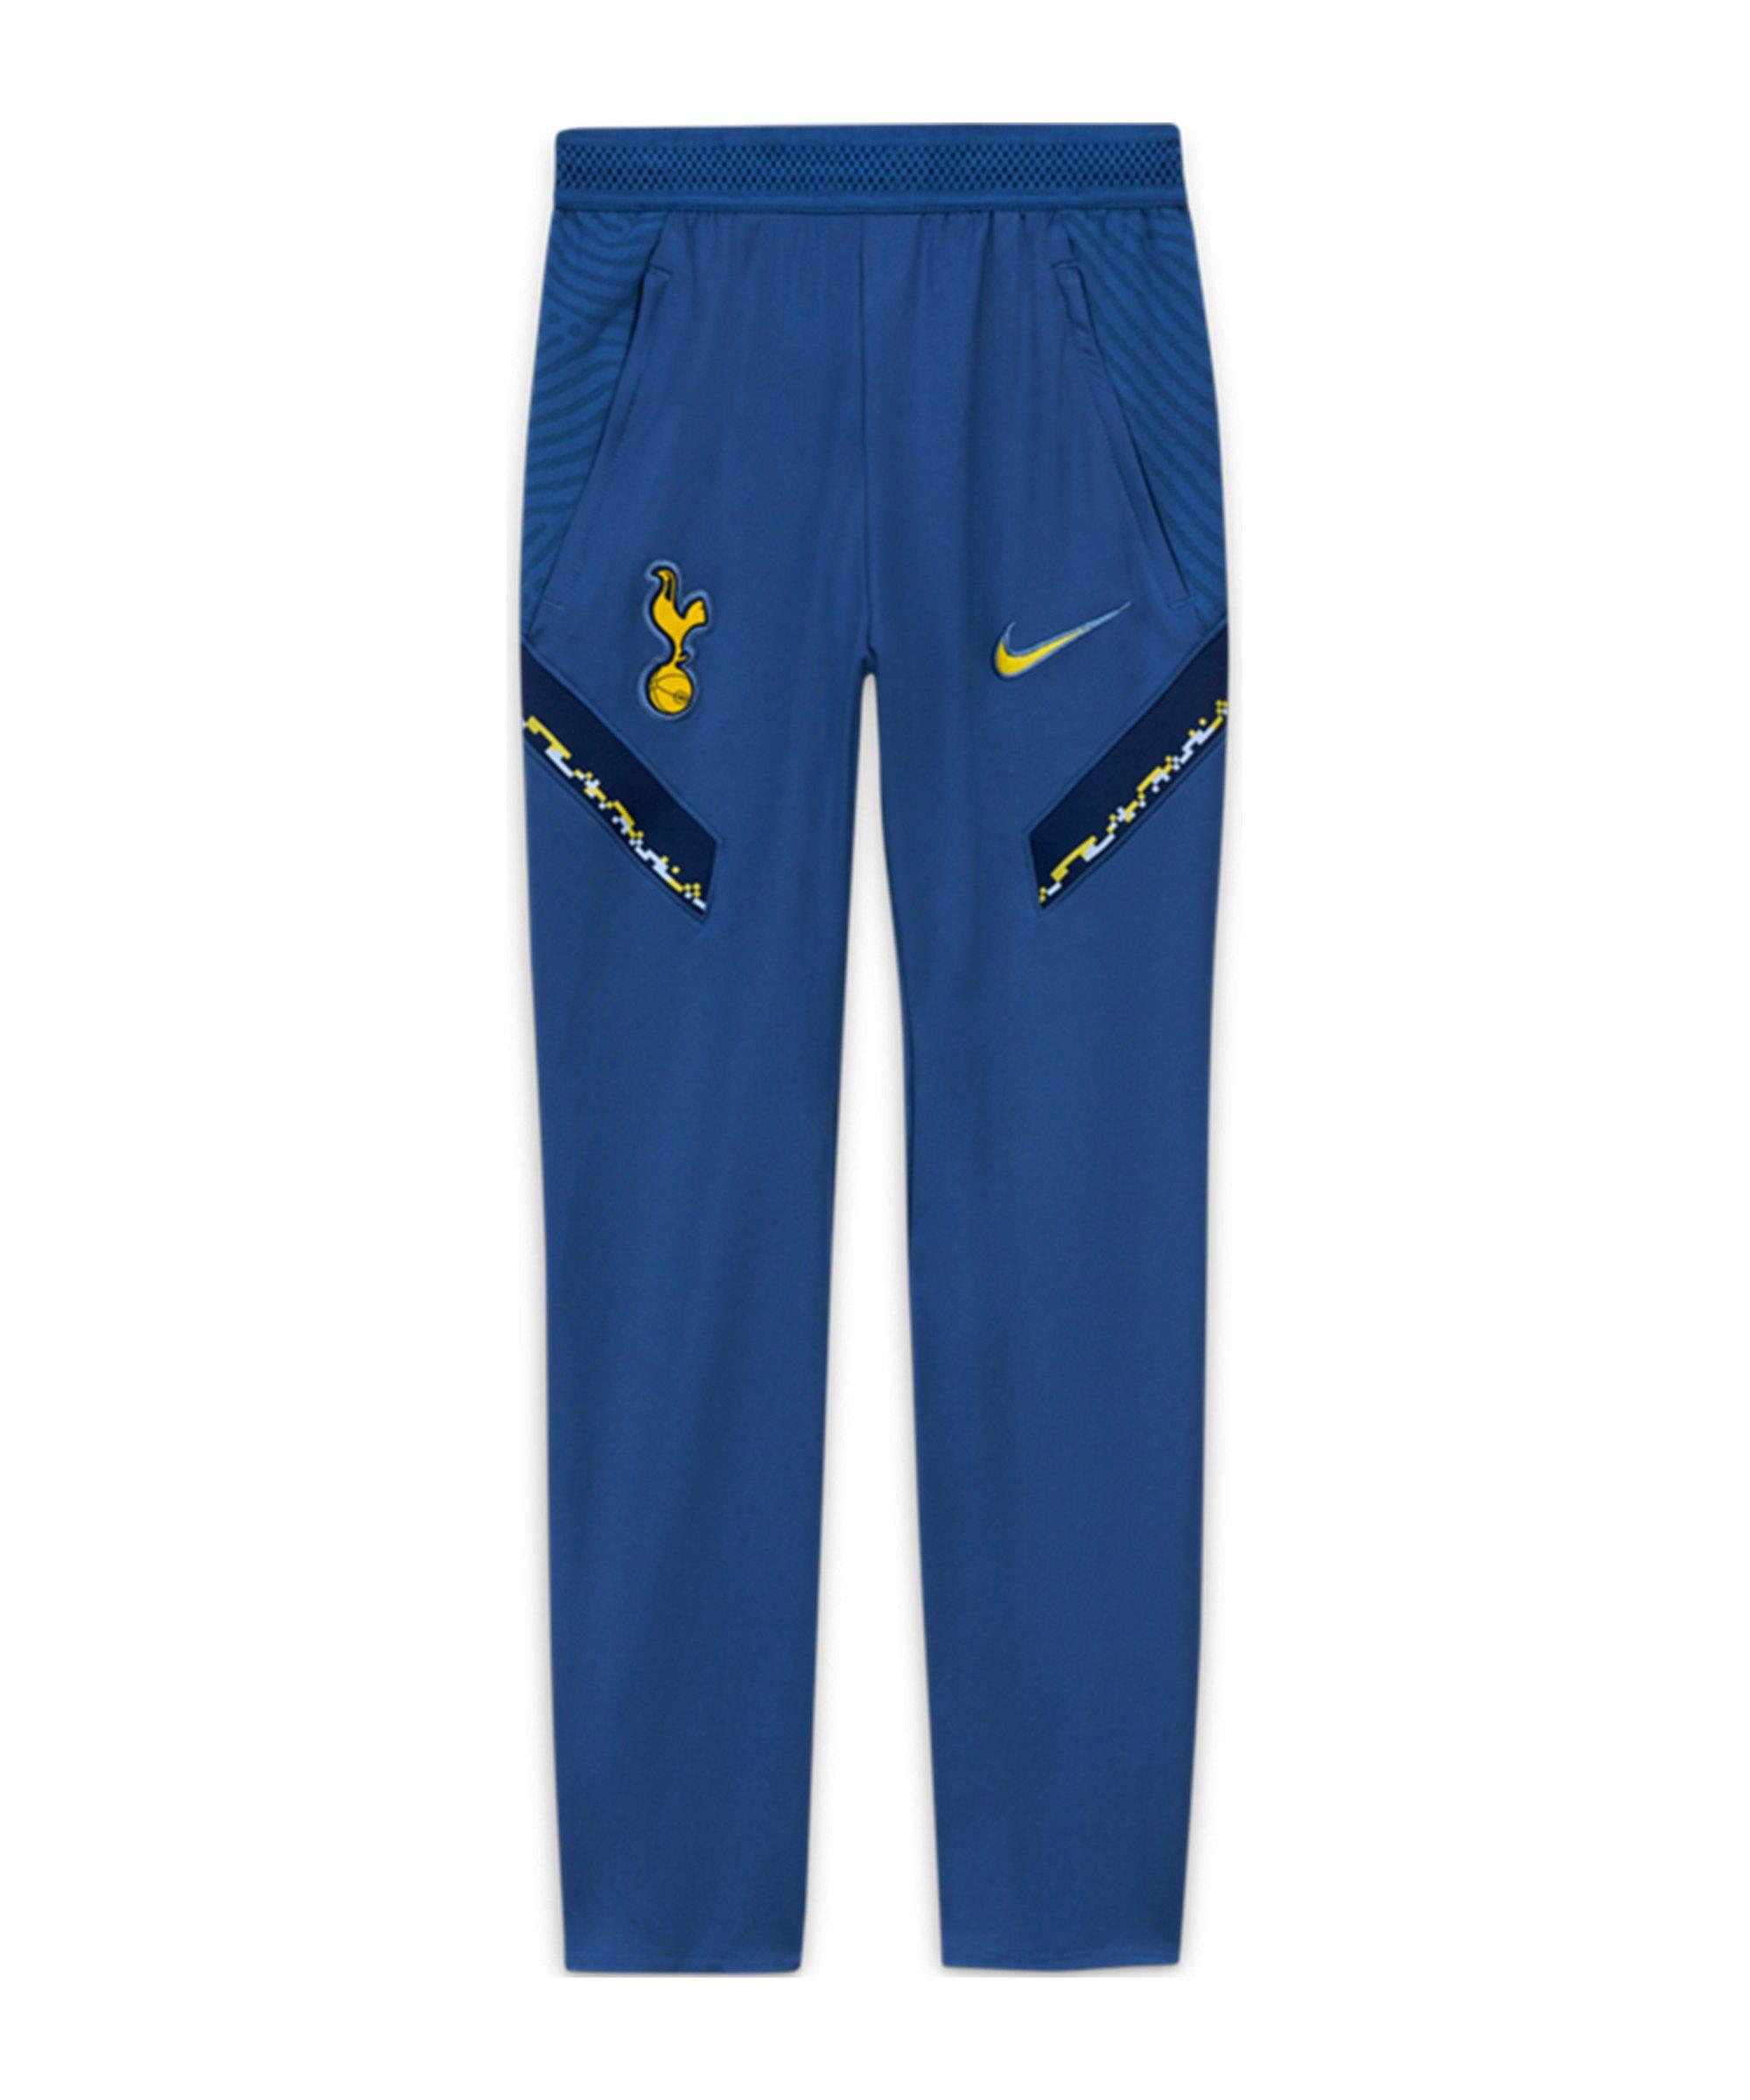 Nike Tottenham Hotspur Dry Strike Trainingshose CL Kids Blau F469 - blau